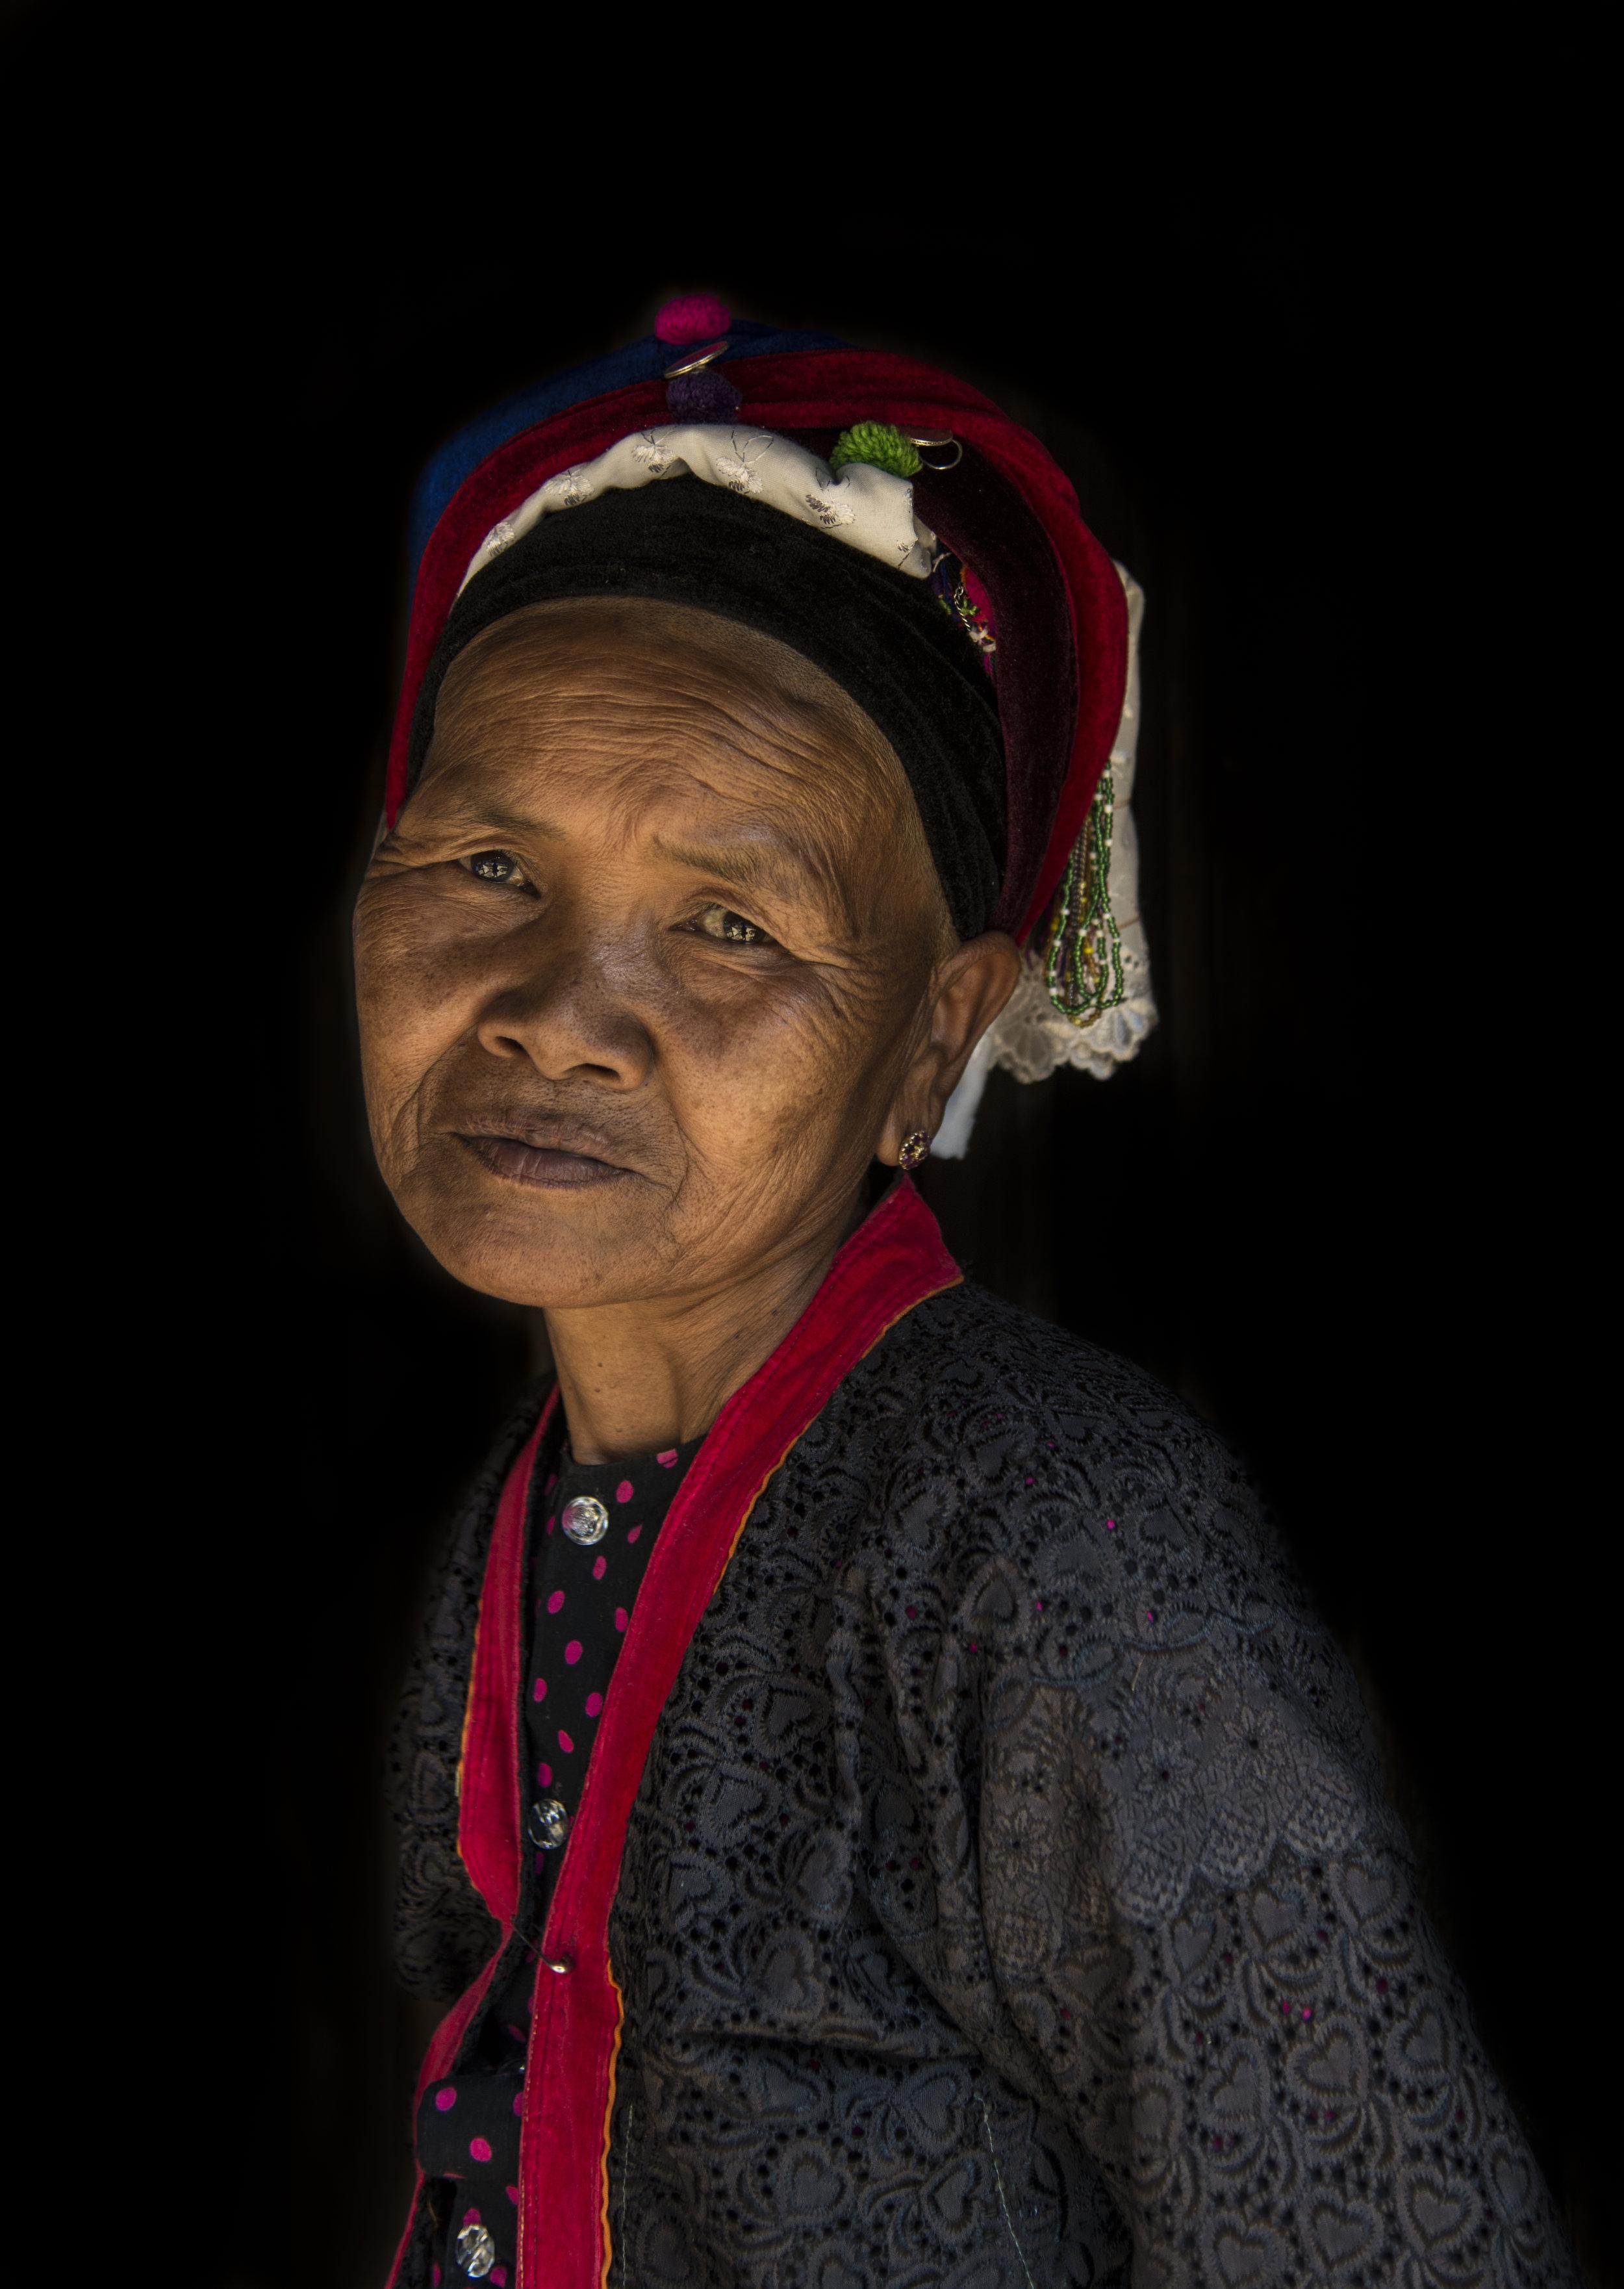 _4.30 Palaung Woman, Myanmar.jpg